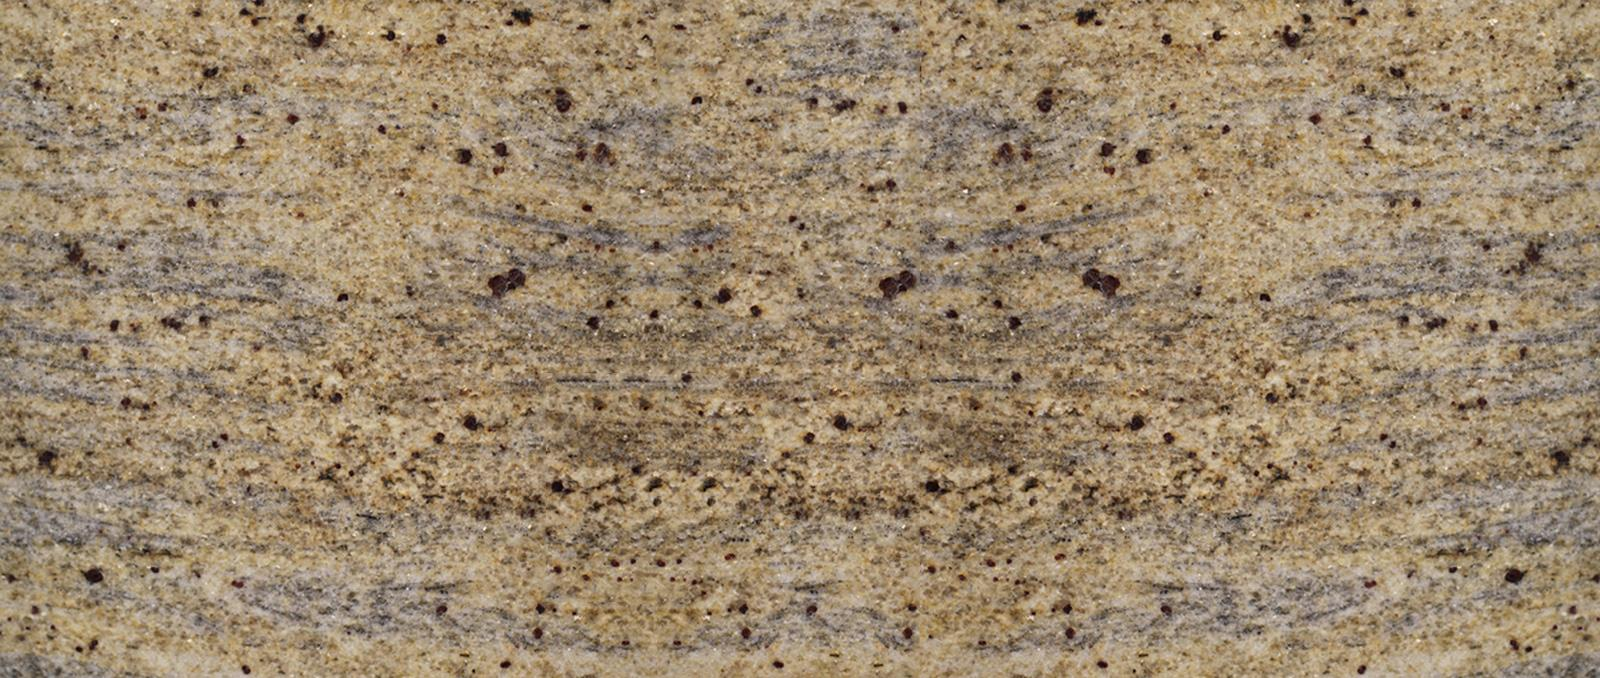 vreaupiatra-granit-kashmire-gold-banner